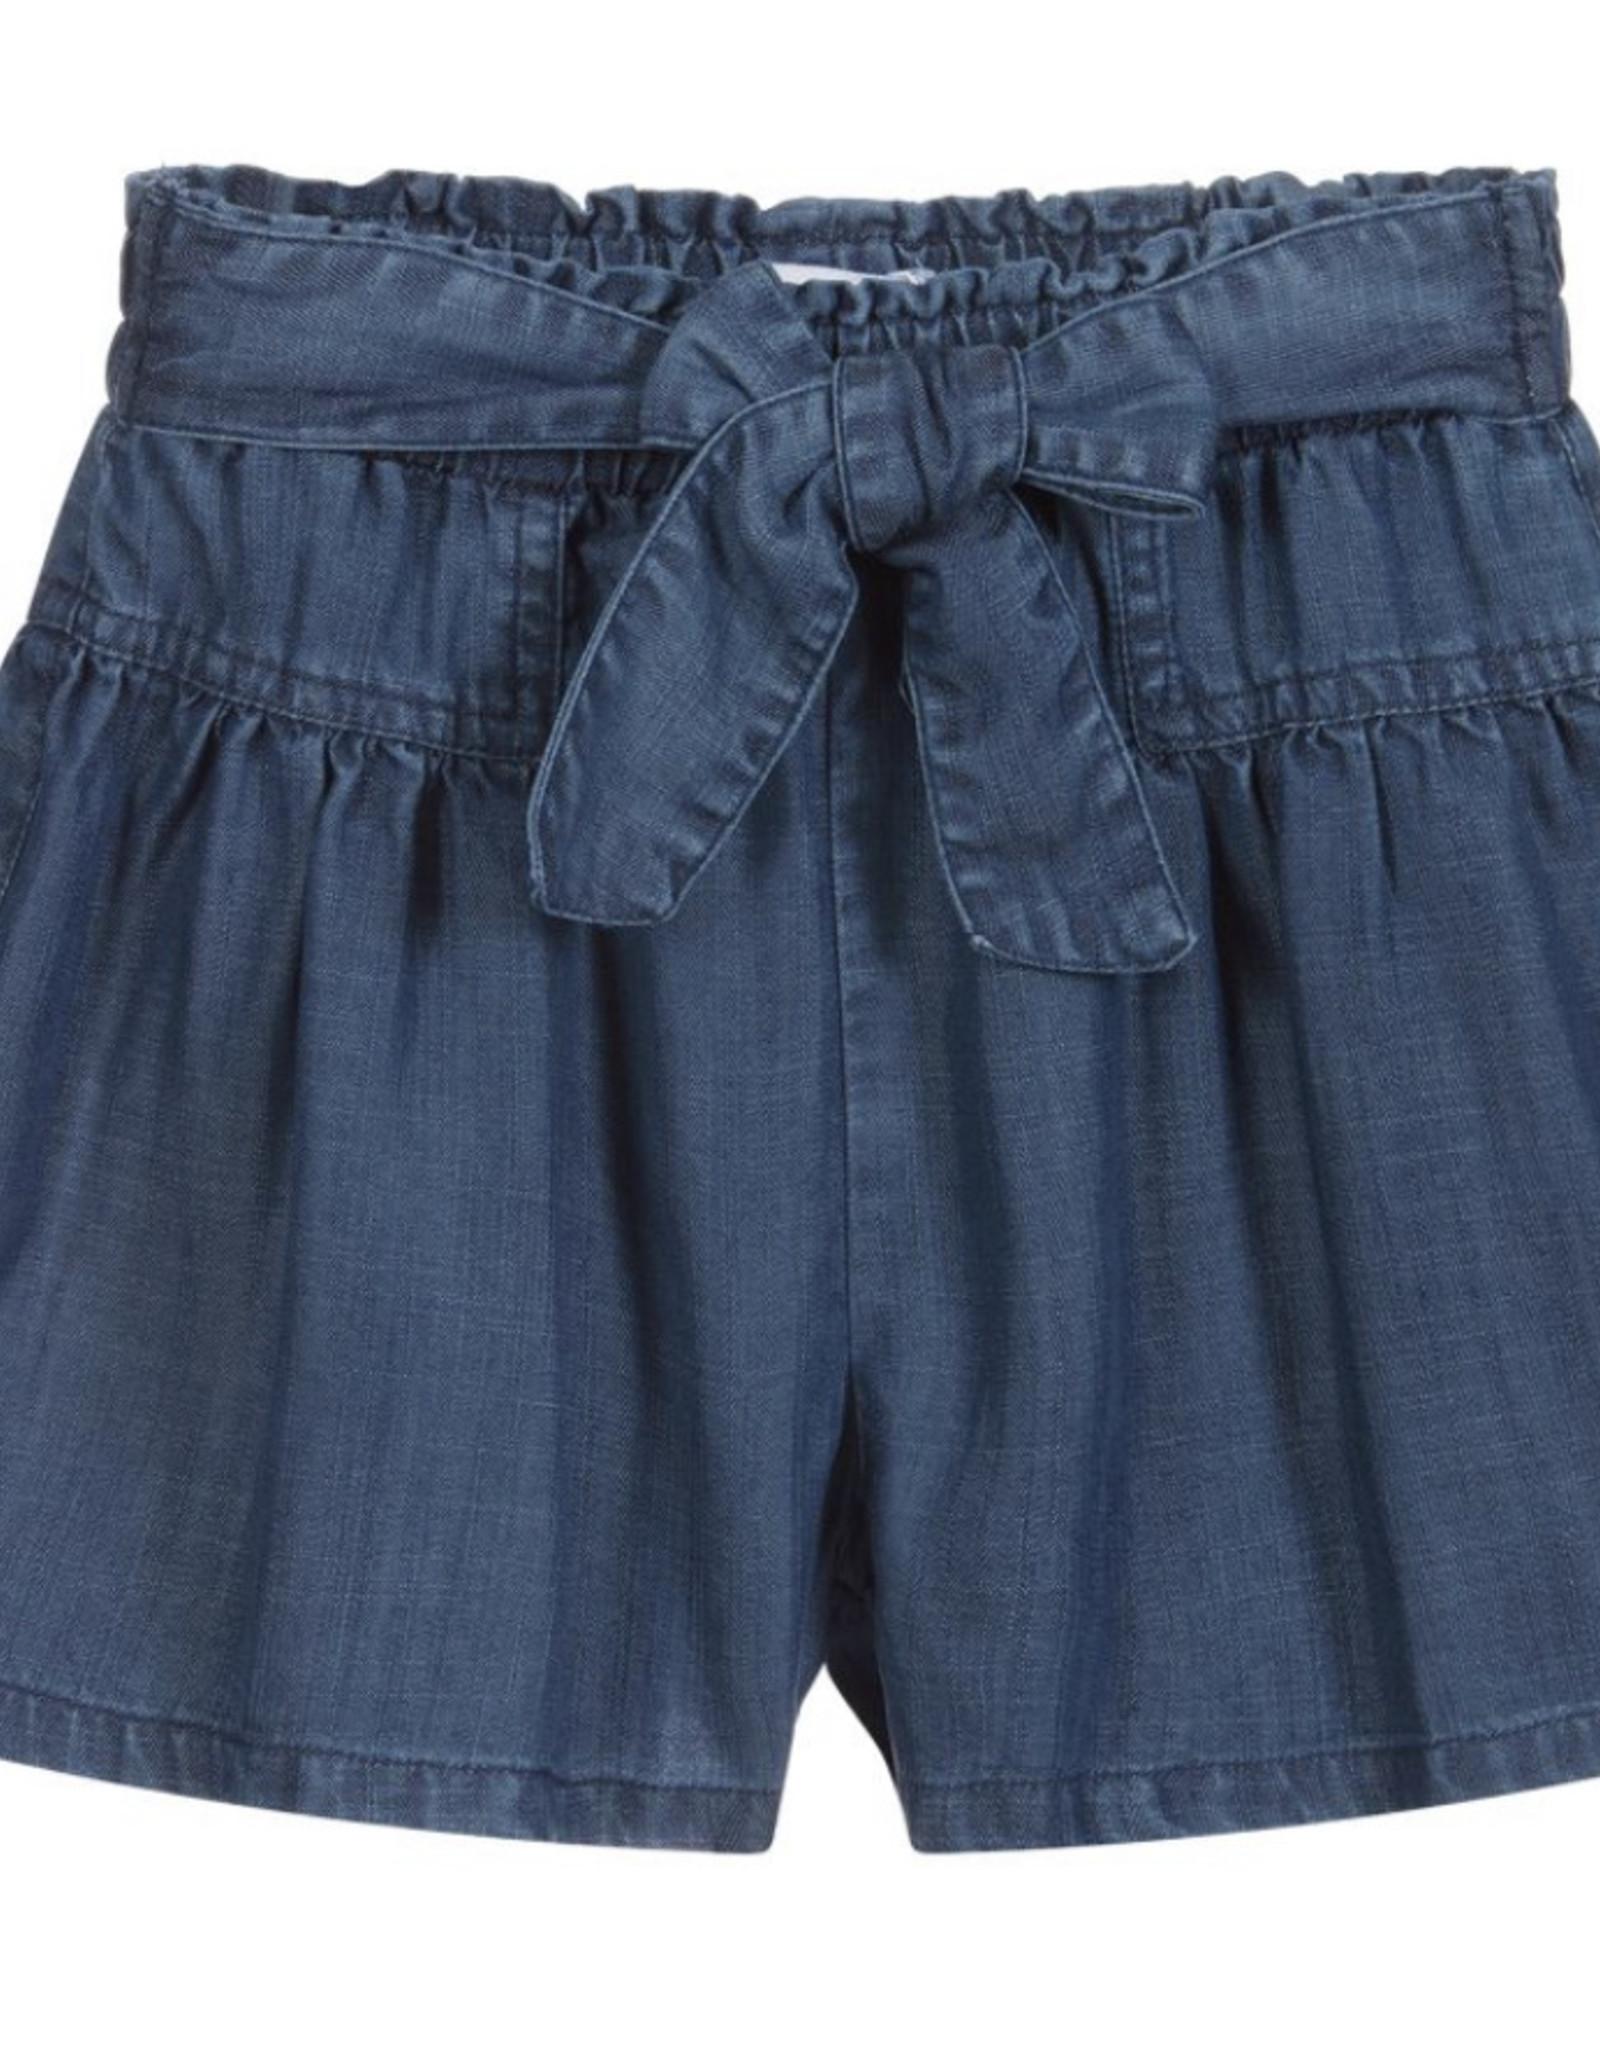 Mayoral Denim Elastic Waist Tie Shorts